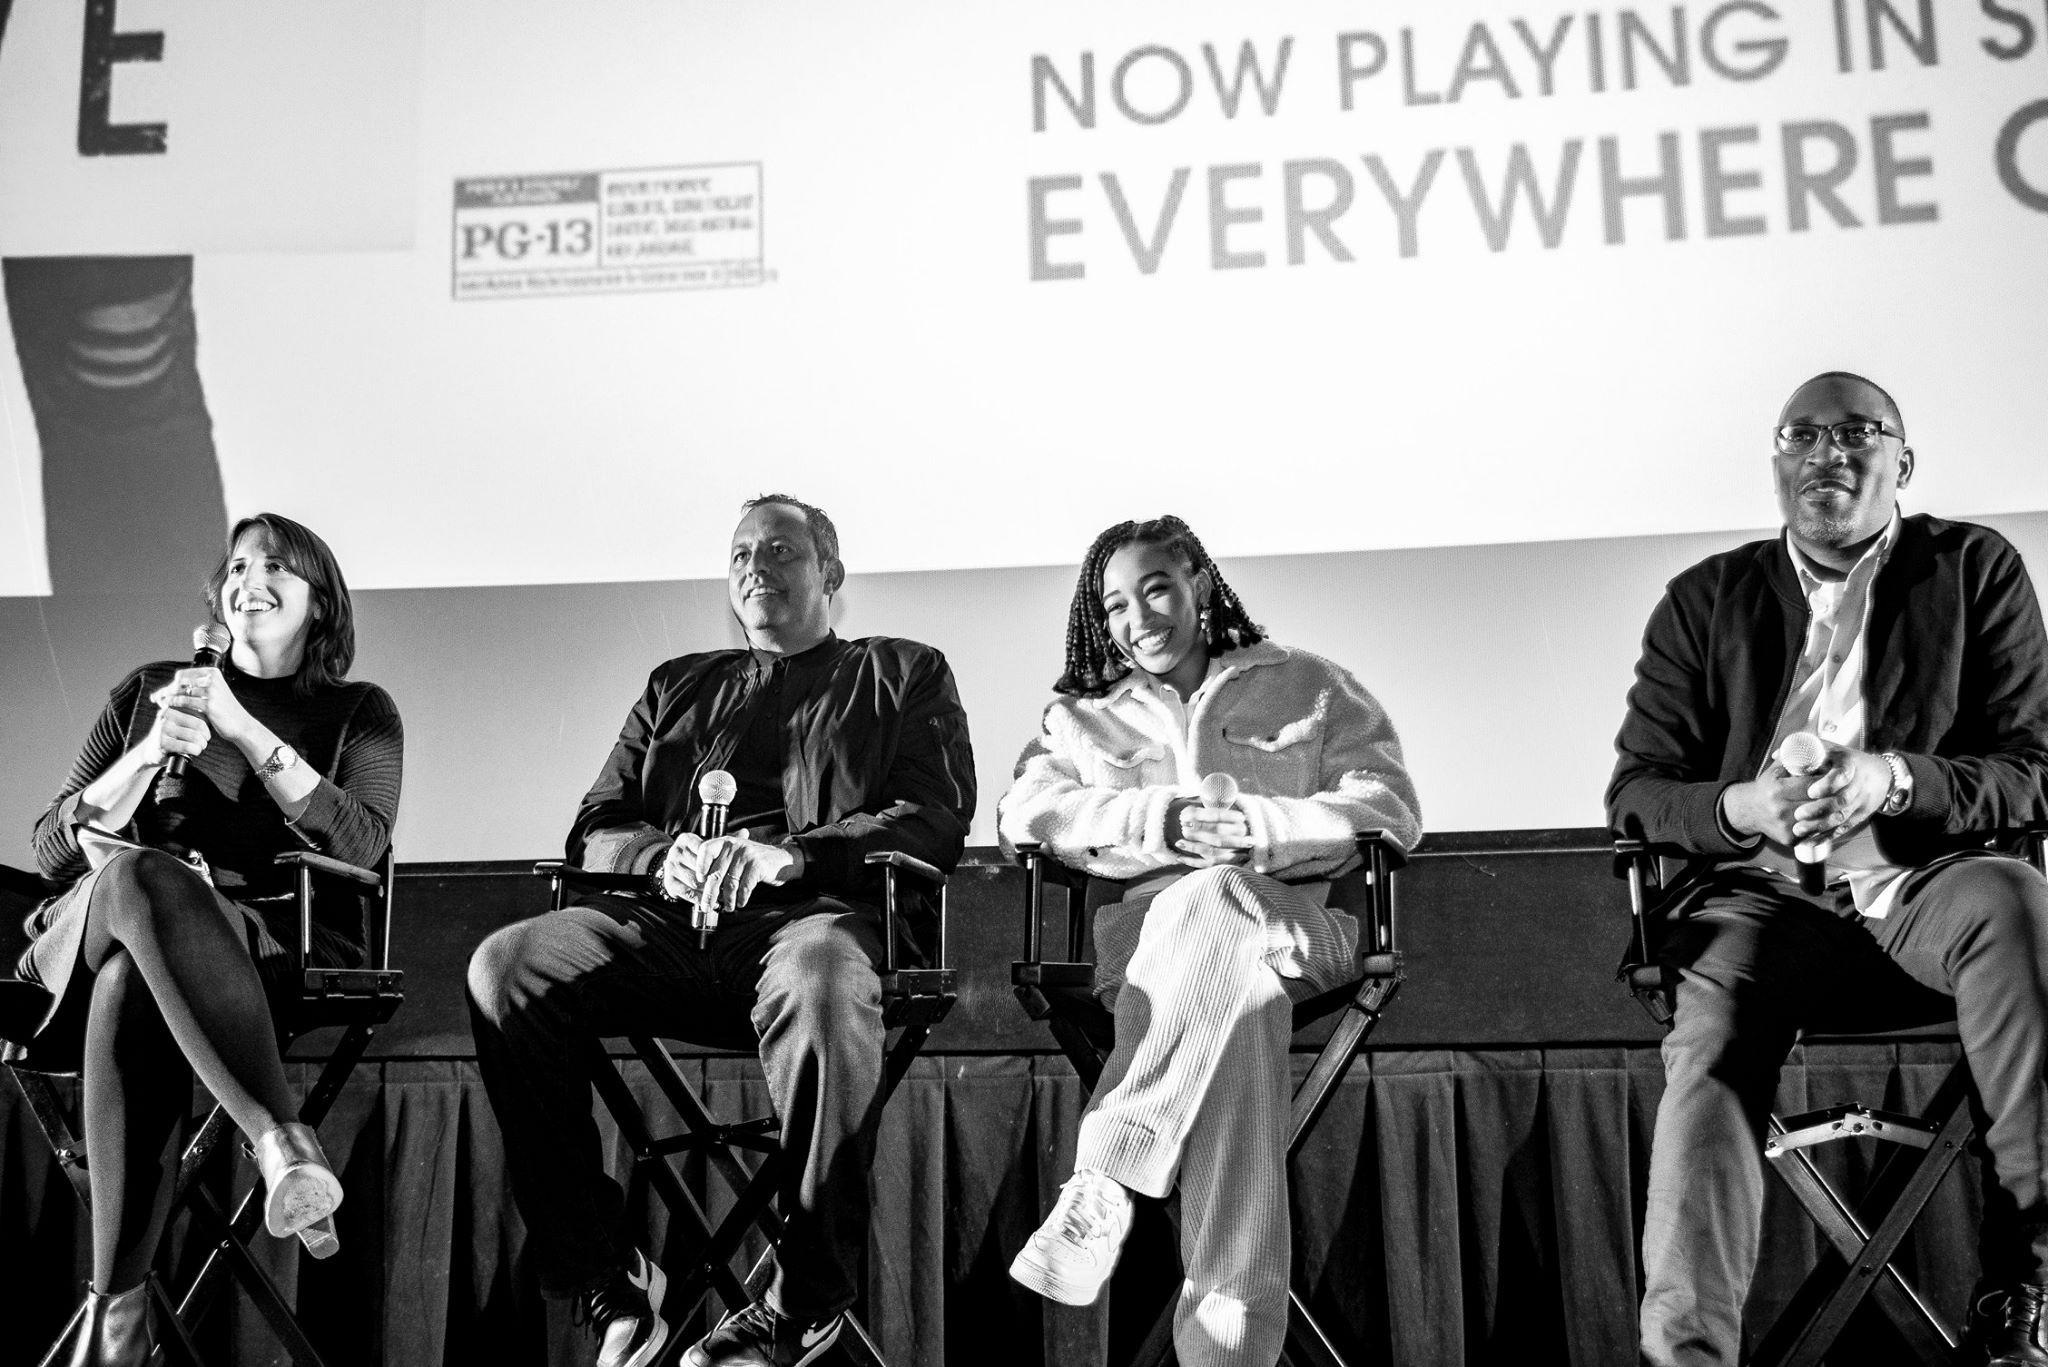 Rebecca Fons (left) leading a CIFF education screening of <i>The Hate U Give</i>.